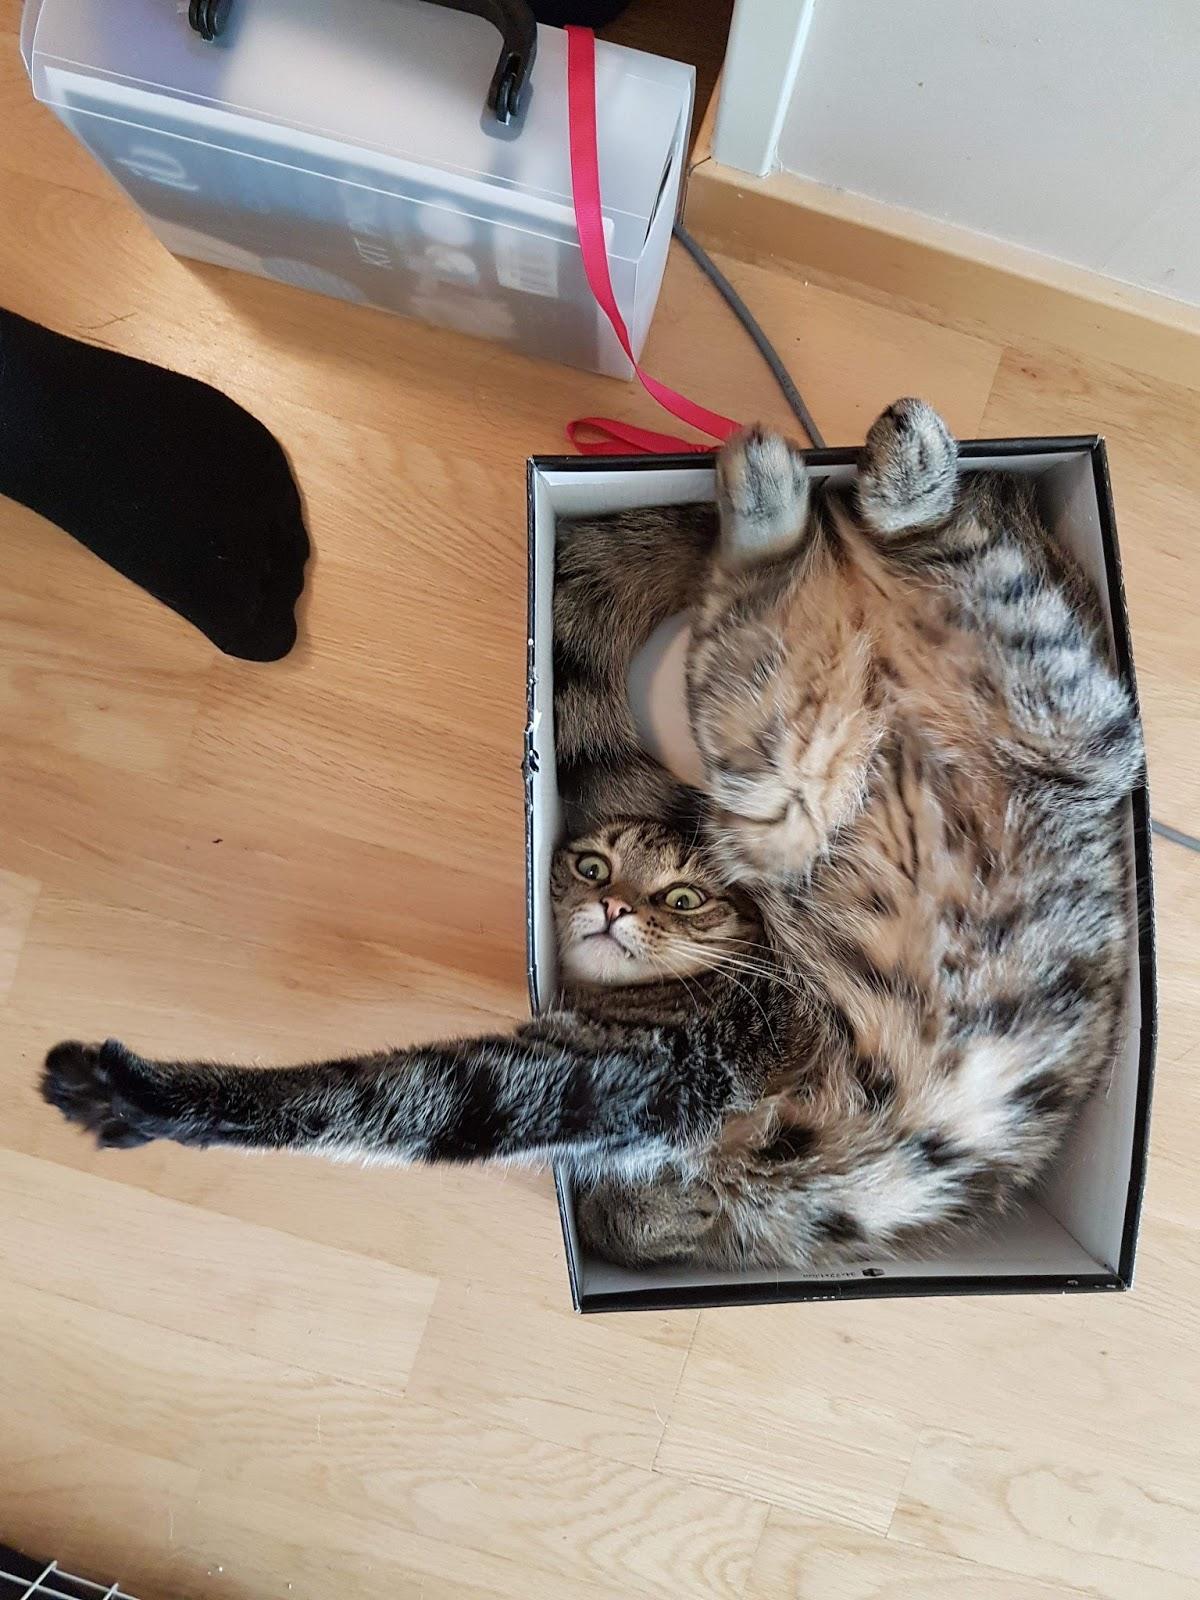 Funny cats - part 235, cat pictures, funny cat images, best cat photos